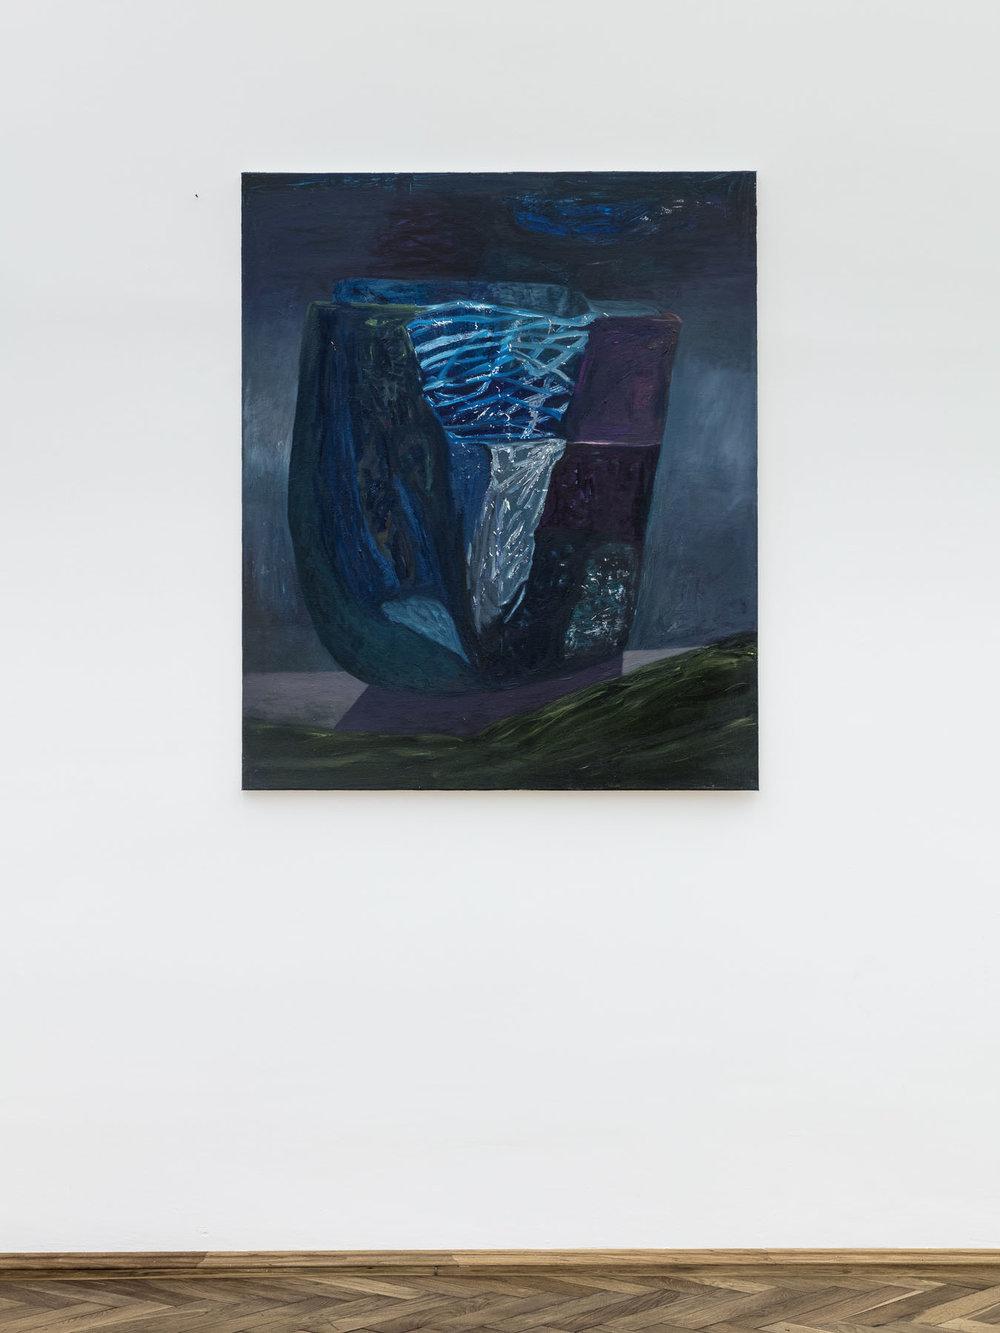 Veronika Hilger, untitled, 2016, oil on canvas, 120 x 100 cm